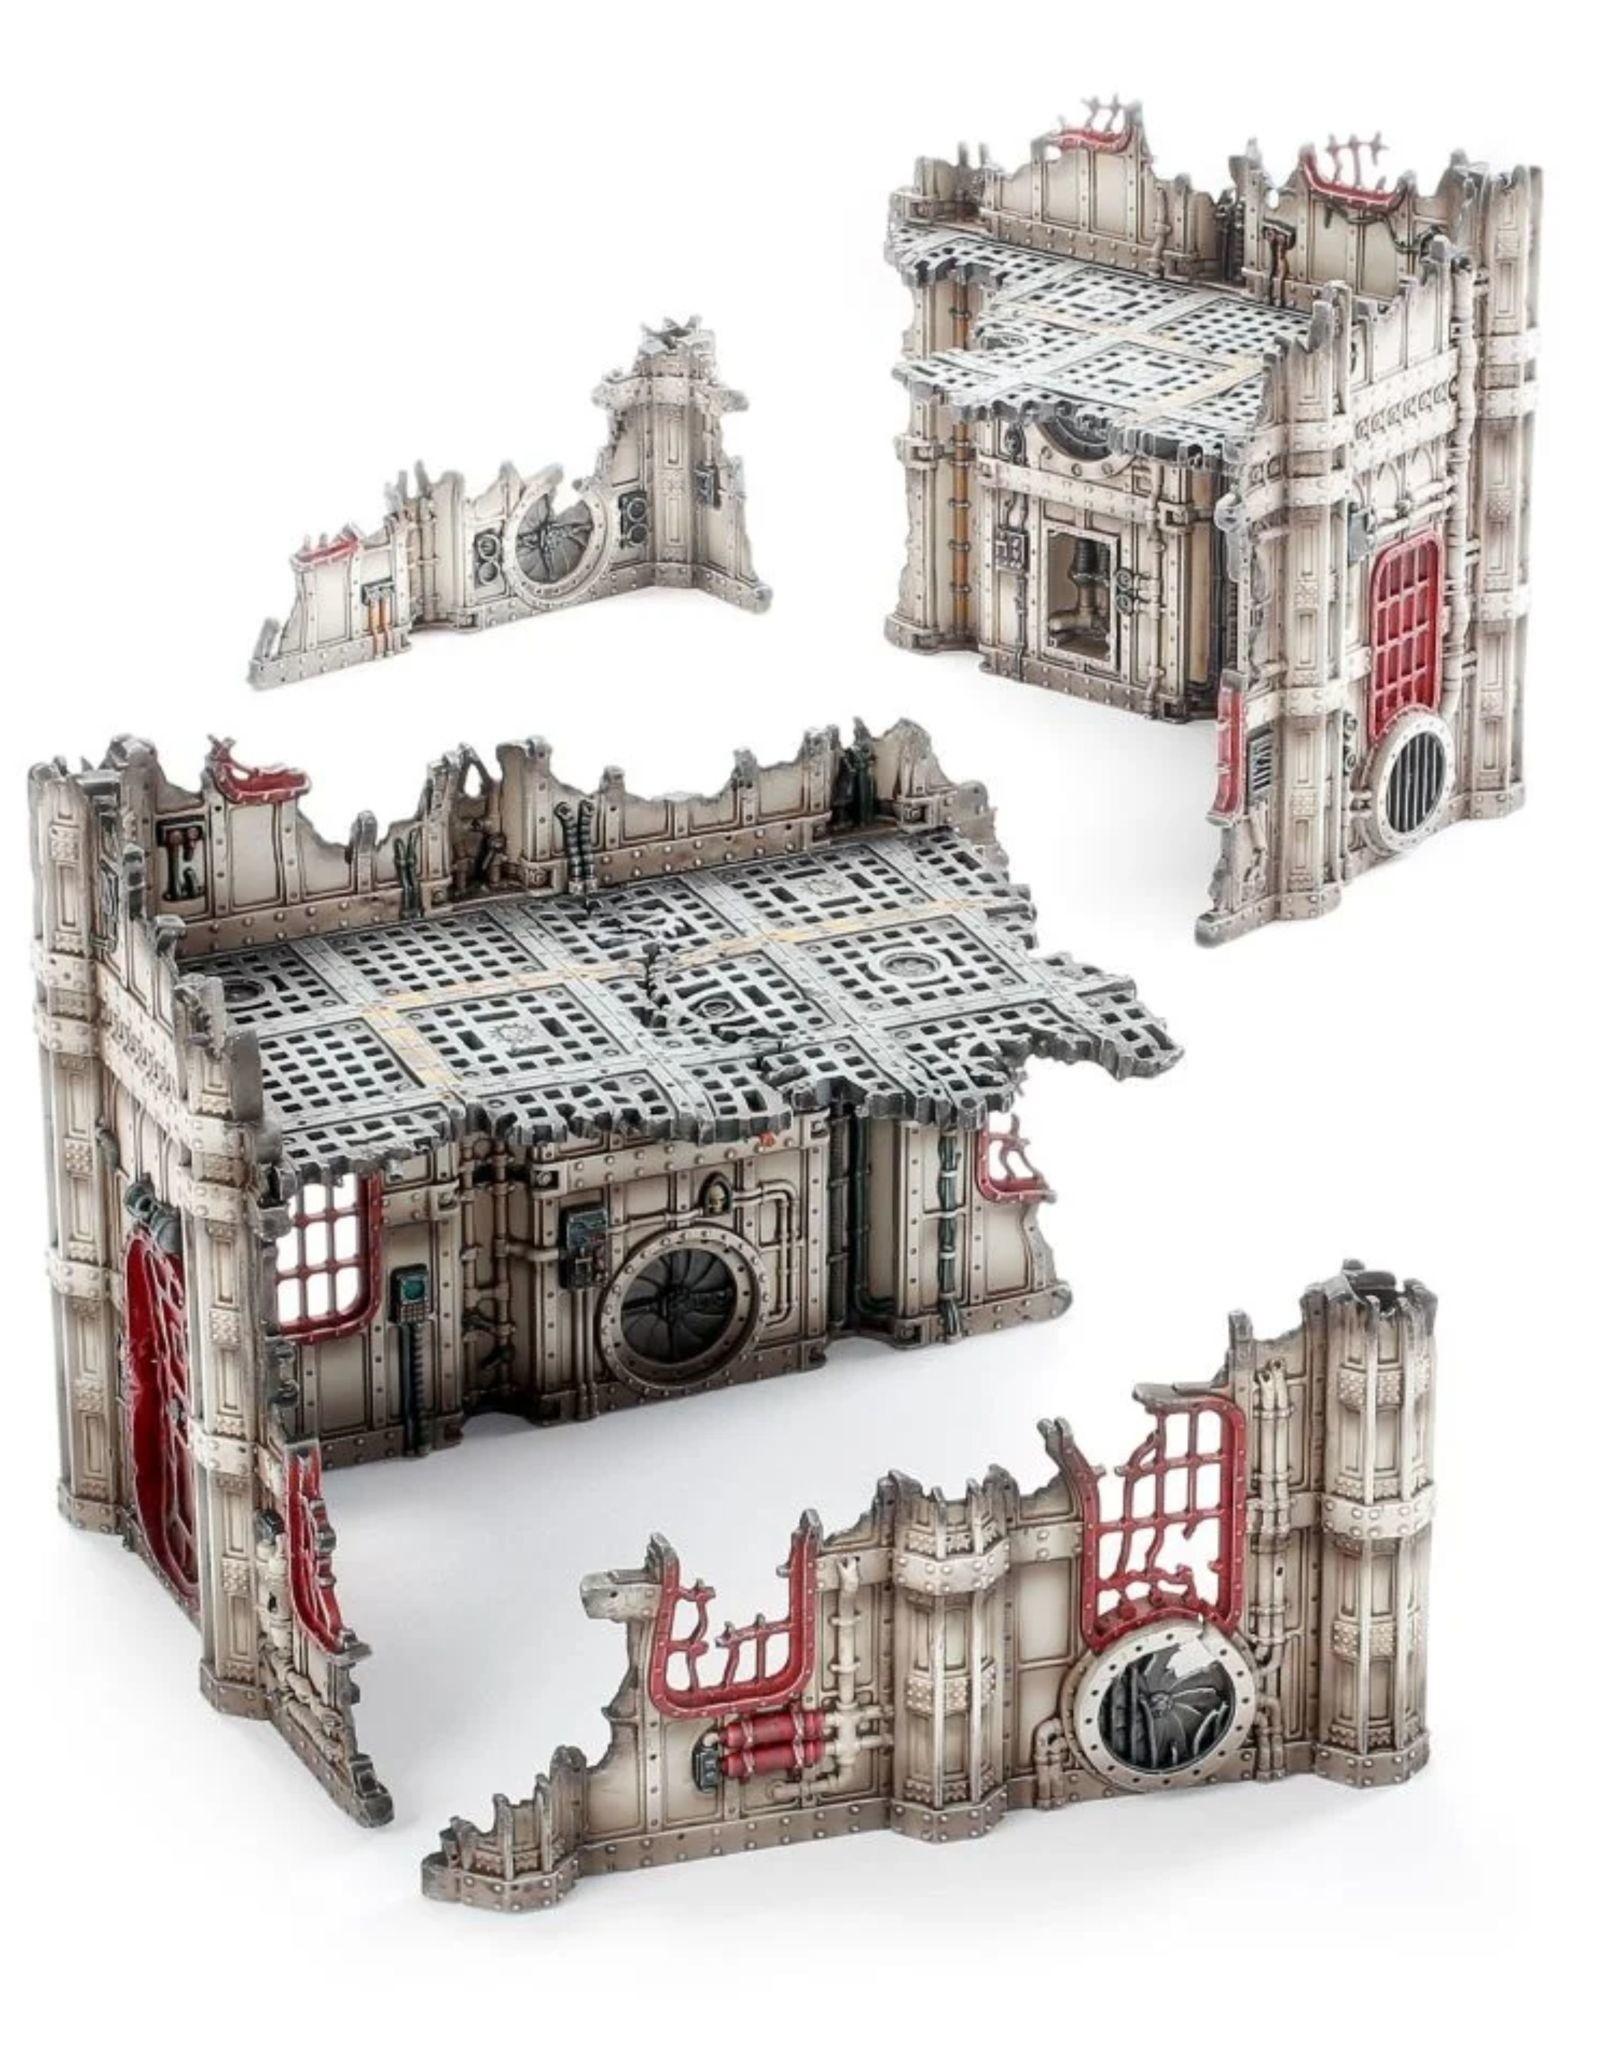 Warhammer 40k Battlezone: Sub-Cloister and Storage Fane